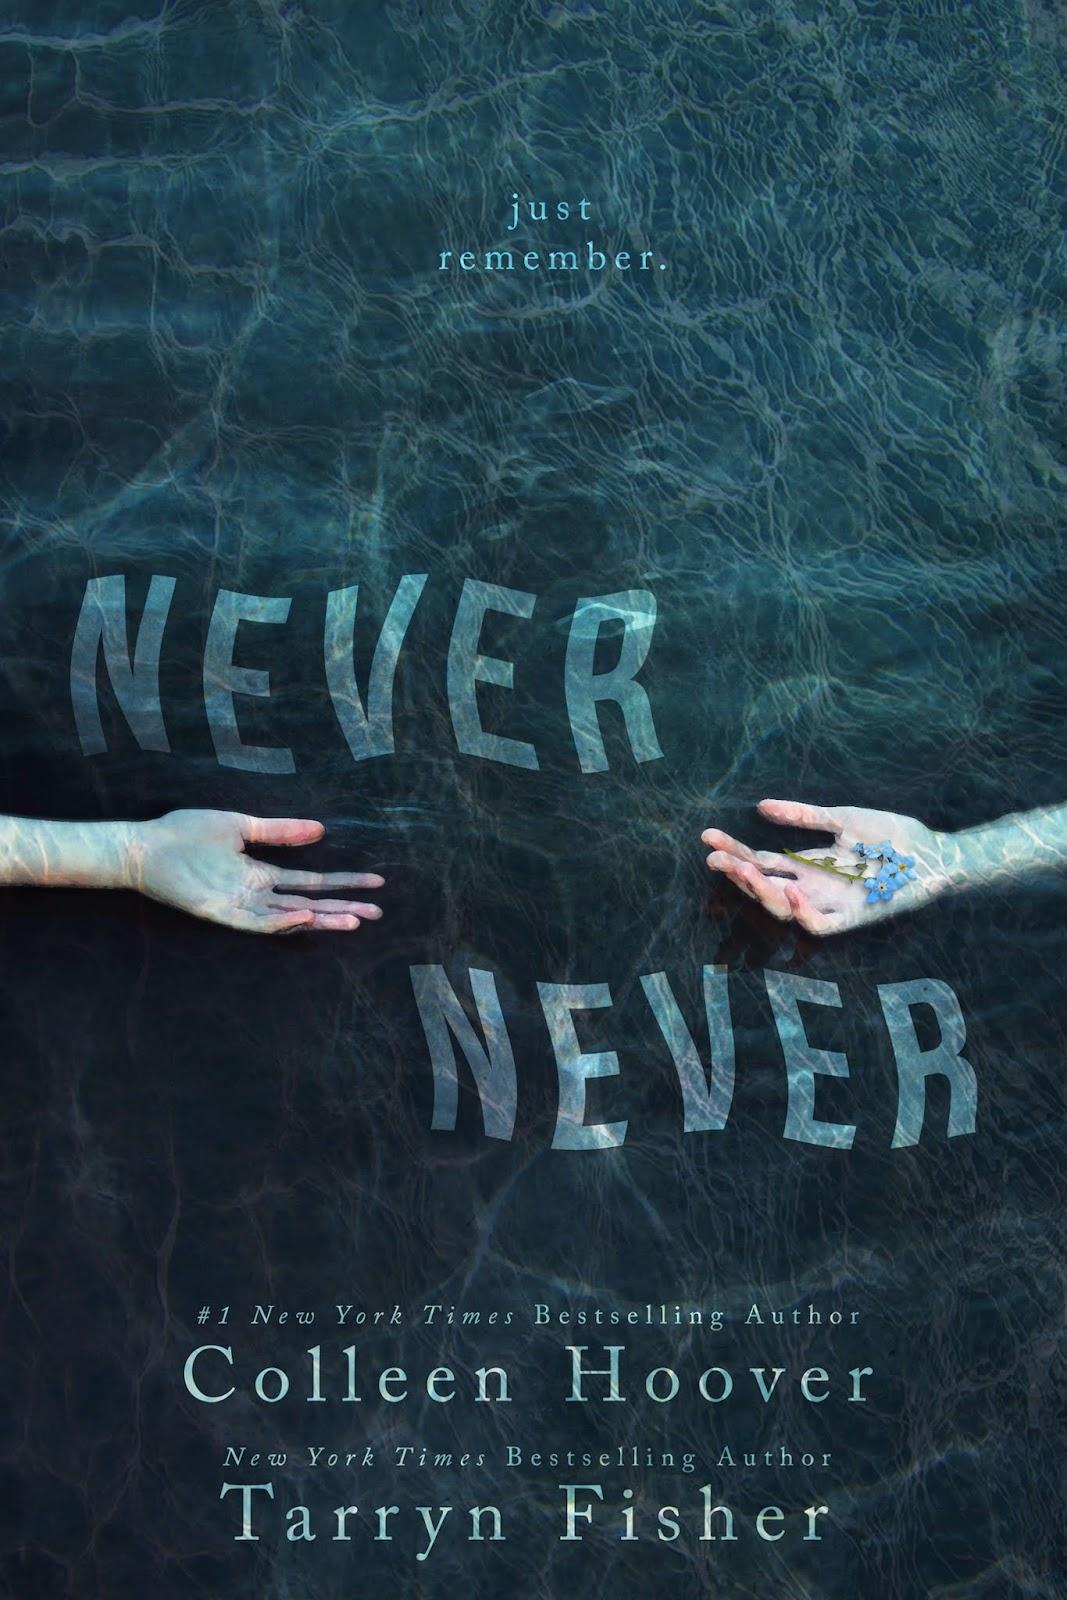 http://lavidadeunalectoraa.blogspot.mx/2015/02/resena-never-never-de-colleen-hoover-y.html